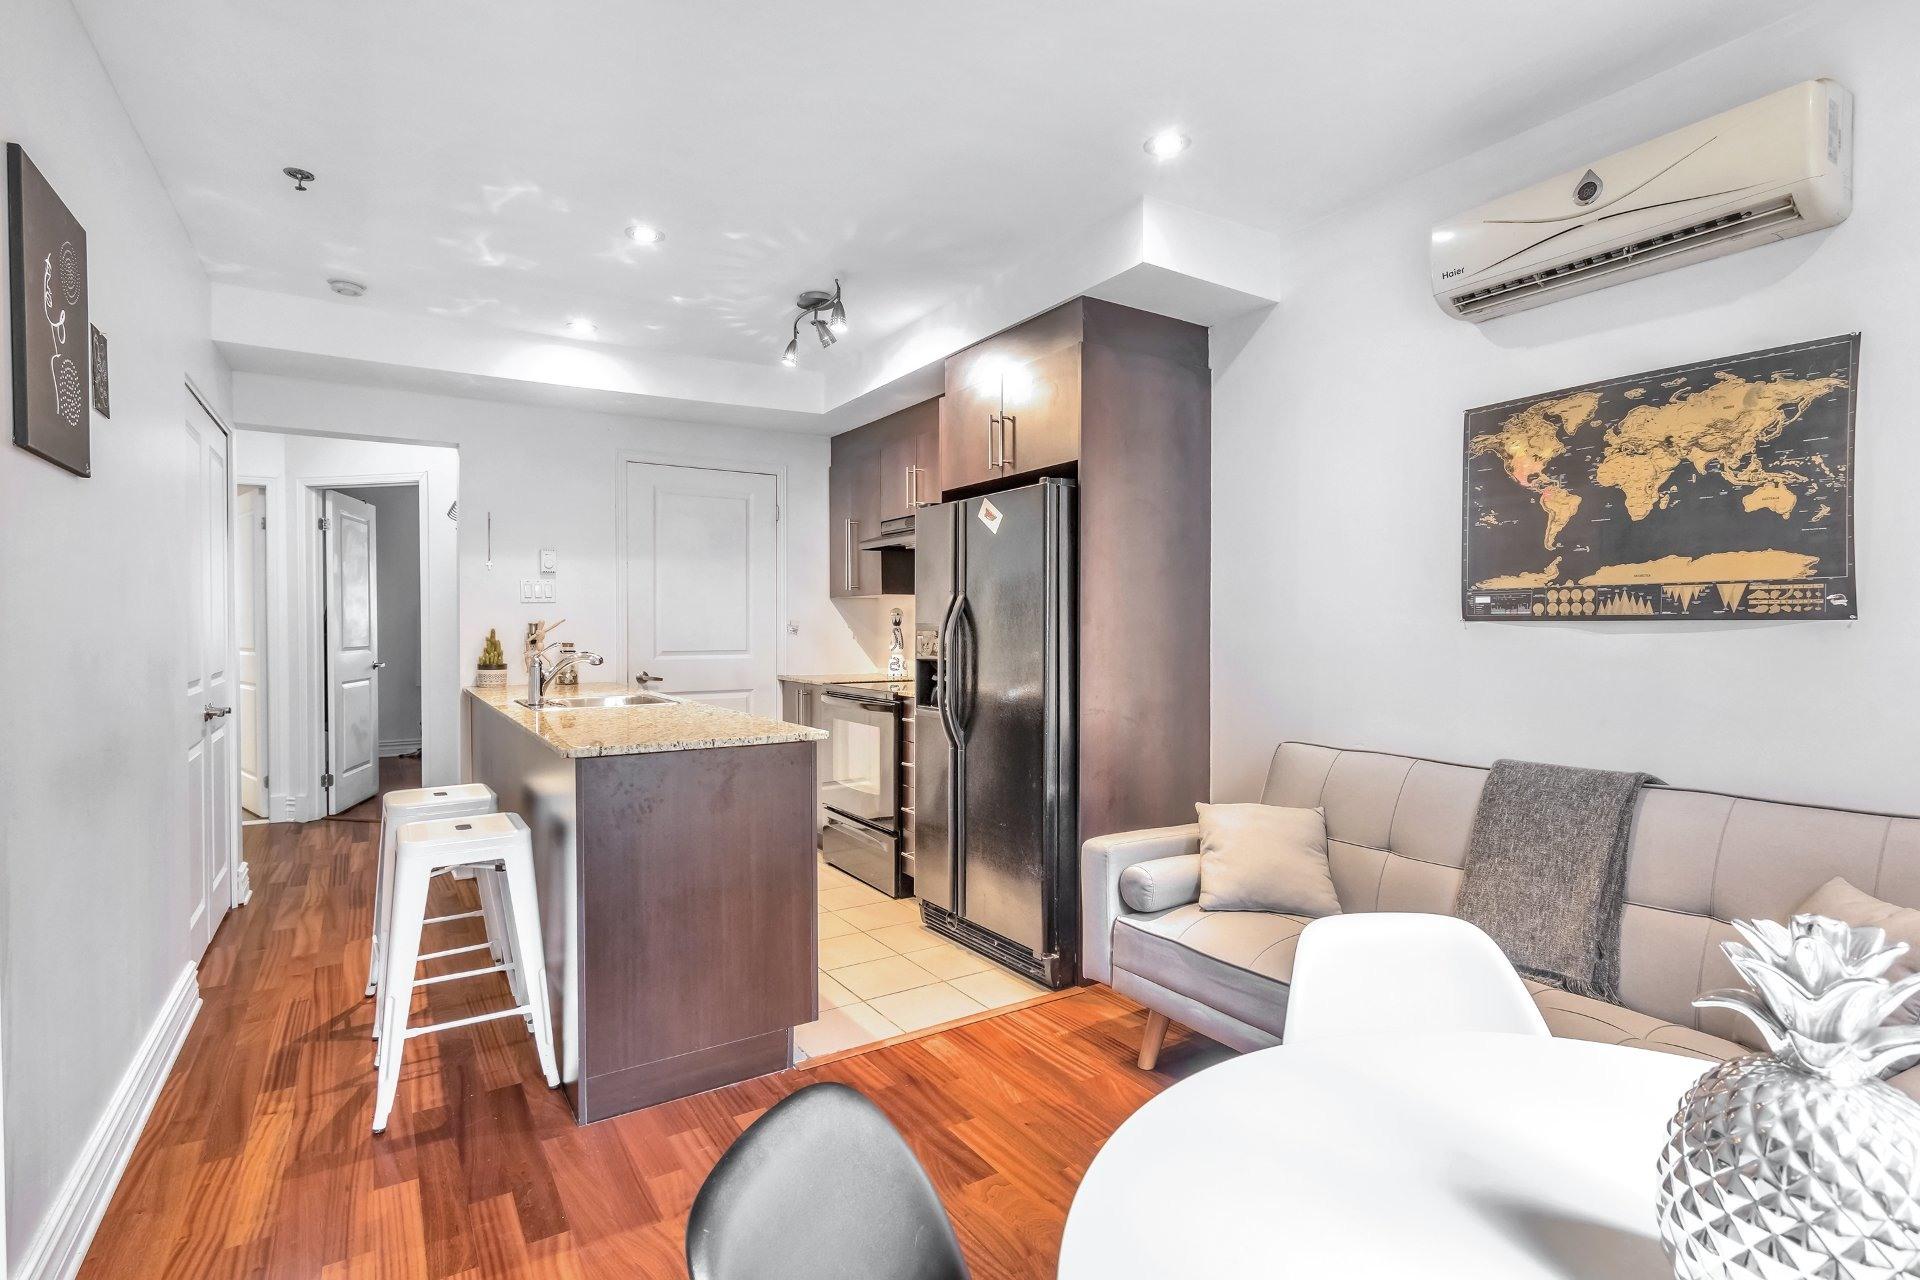 image 5 - Departamento En venta Le Plateau-Mont-Royal Montréal  - 3 habitaciones